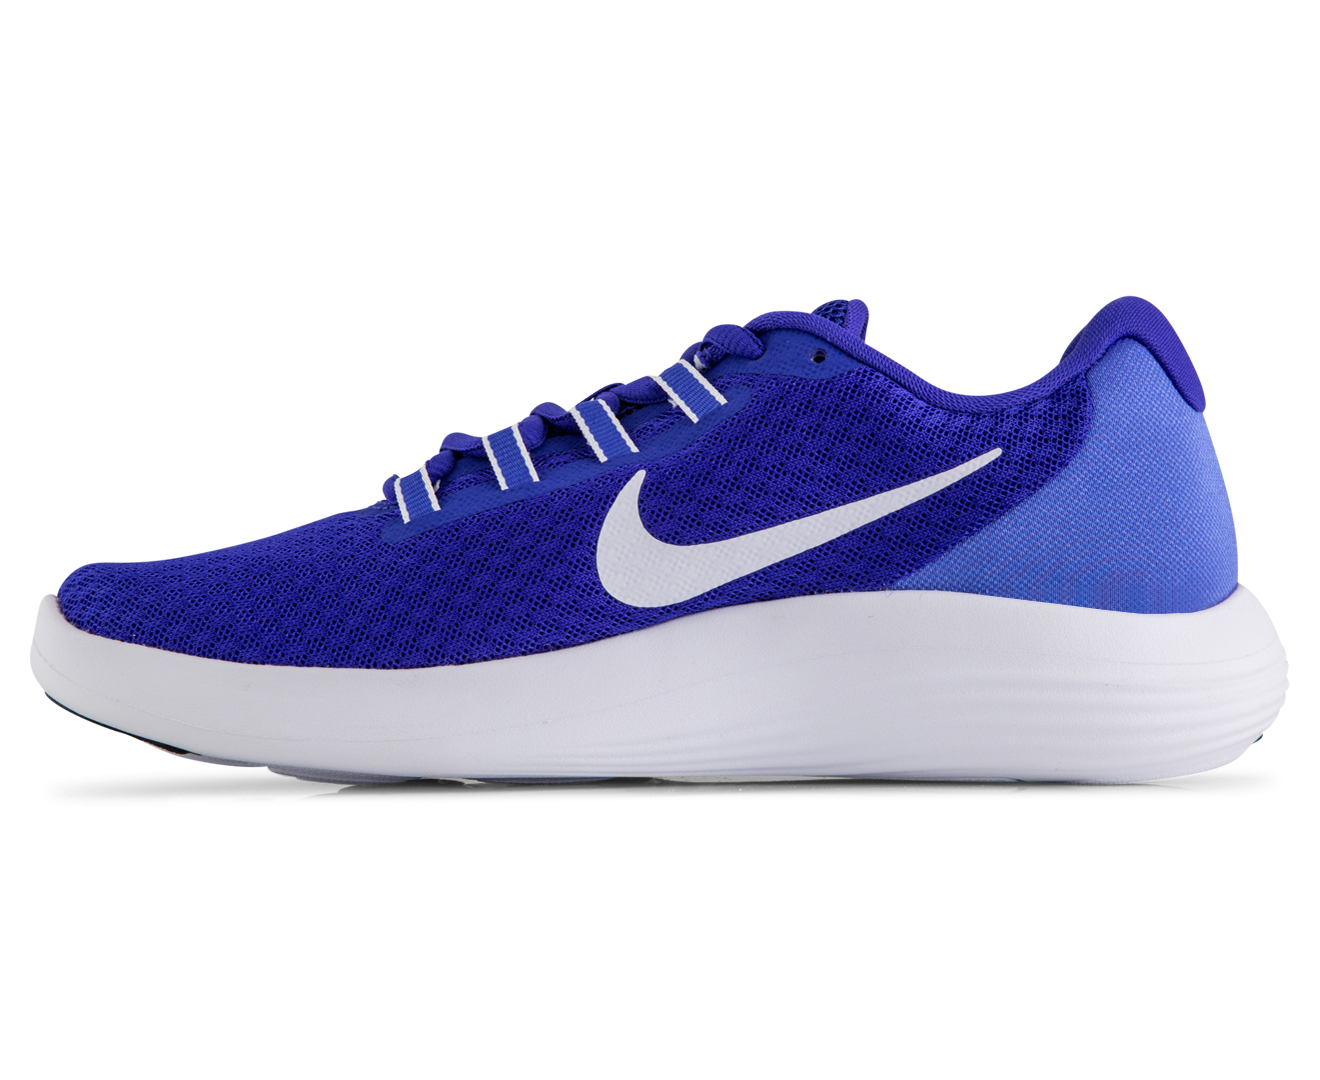 Nike Women's Lunarconverge Shoe - Blue/White | Great daily deals at  Australia's favourite superstore | Catch.com.au